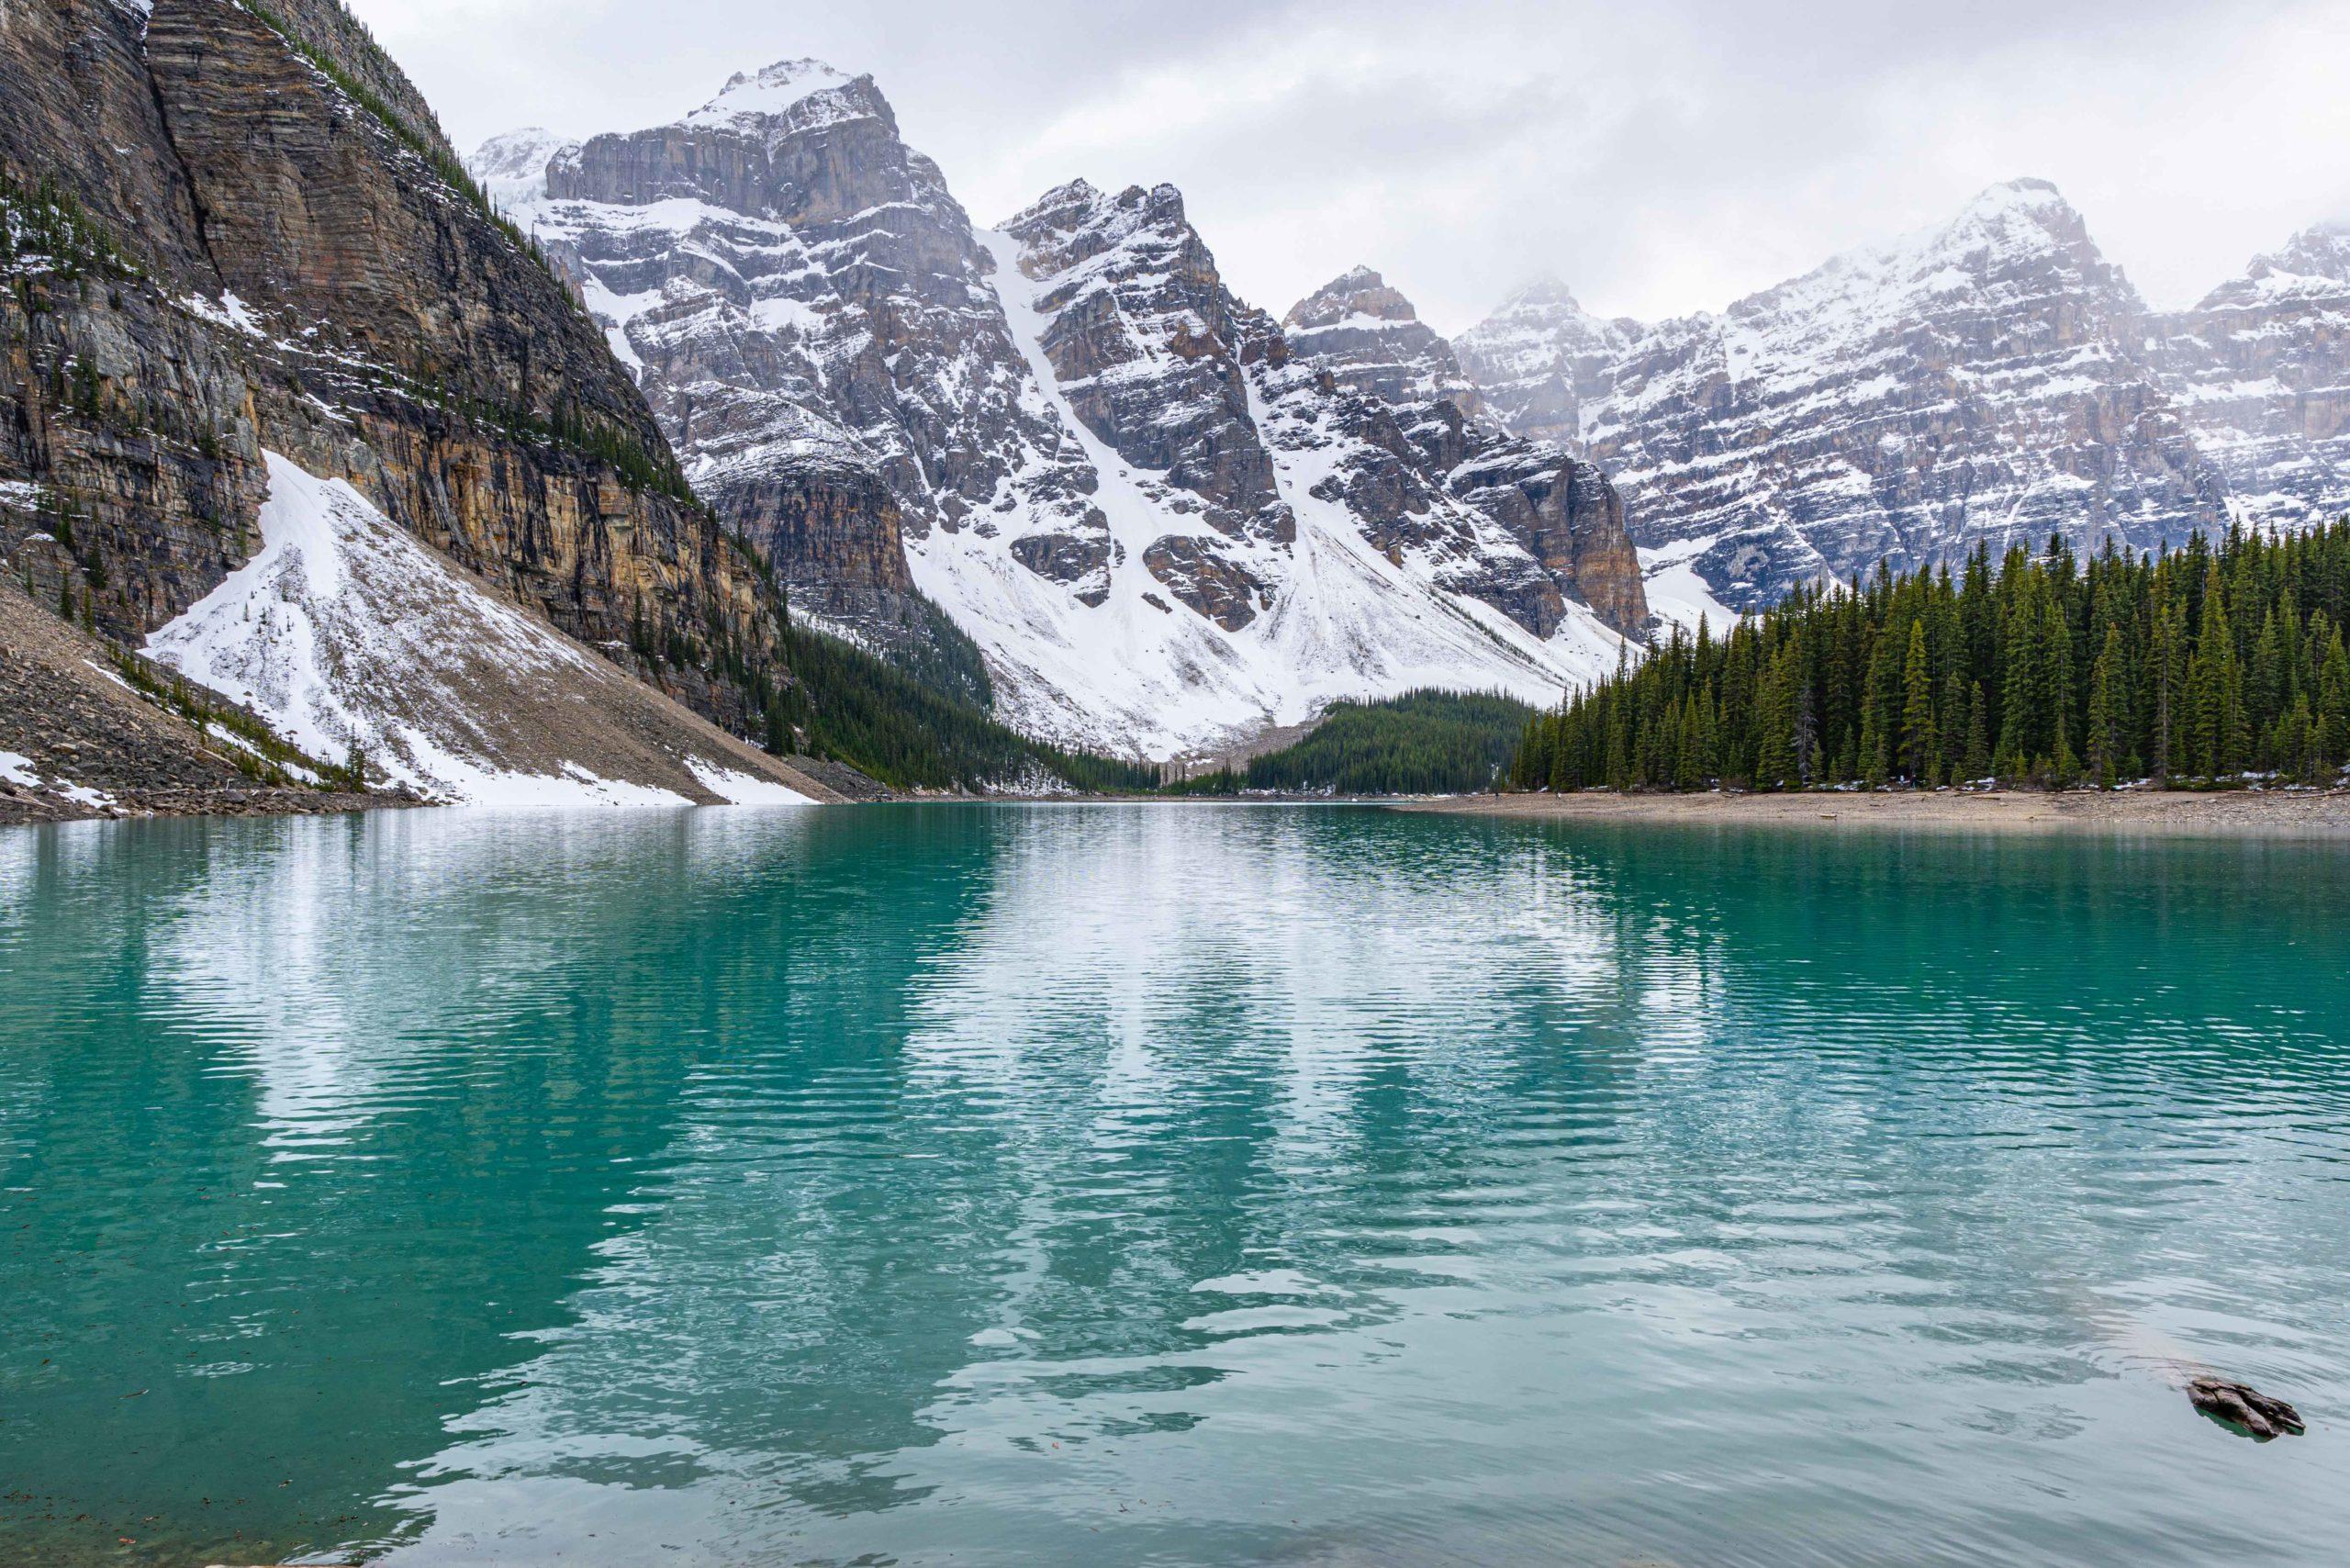 Moraine Lake by Jack Hawkins